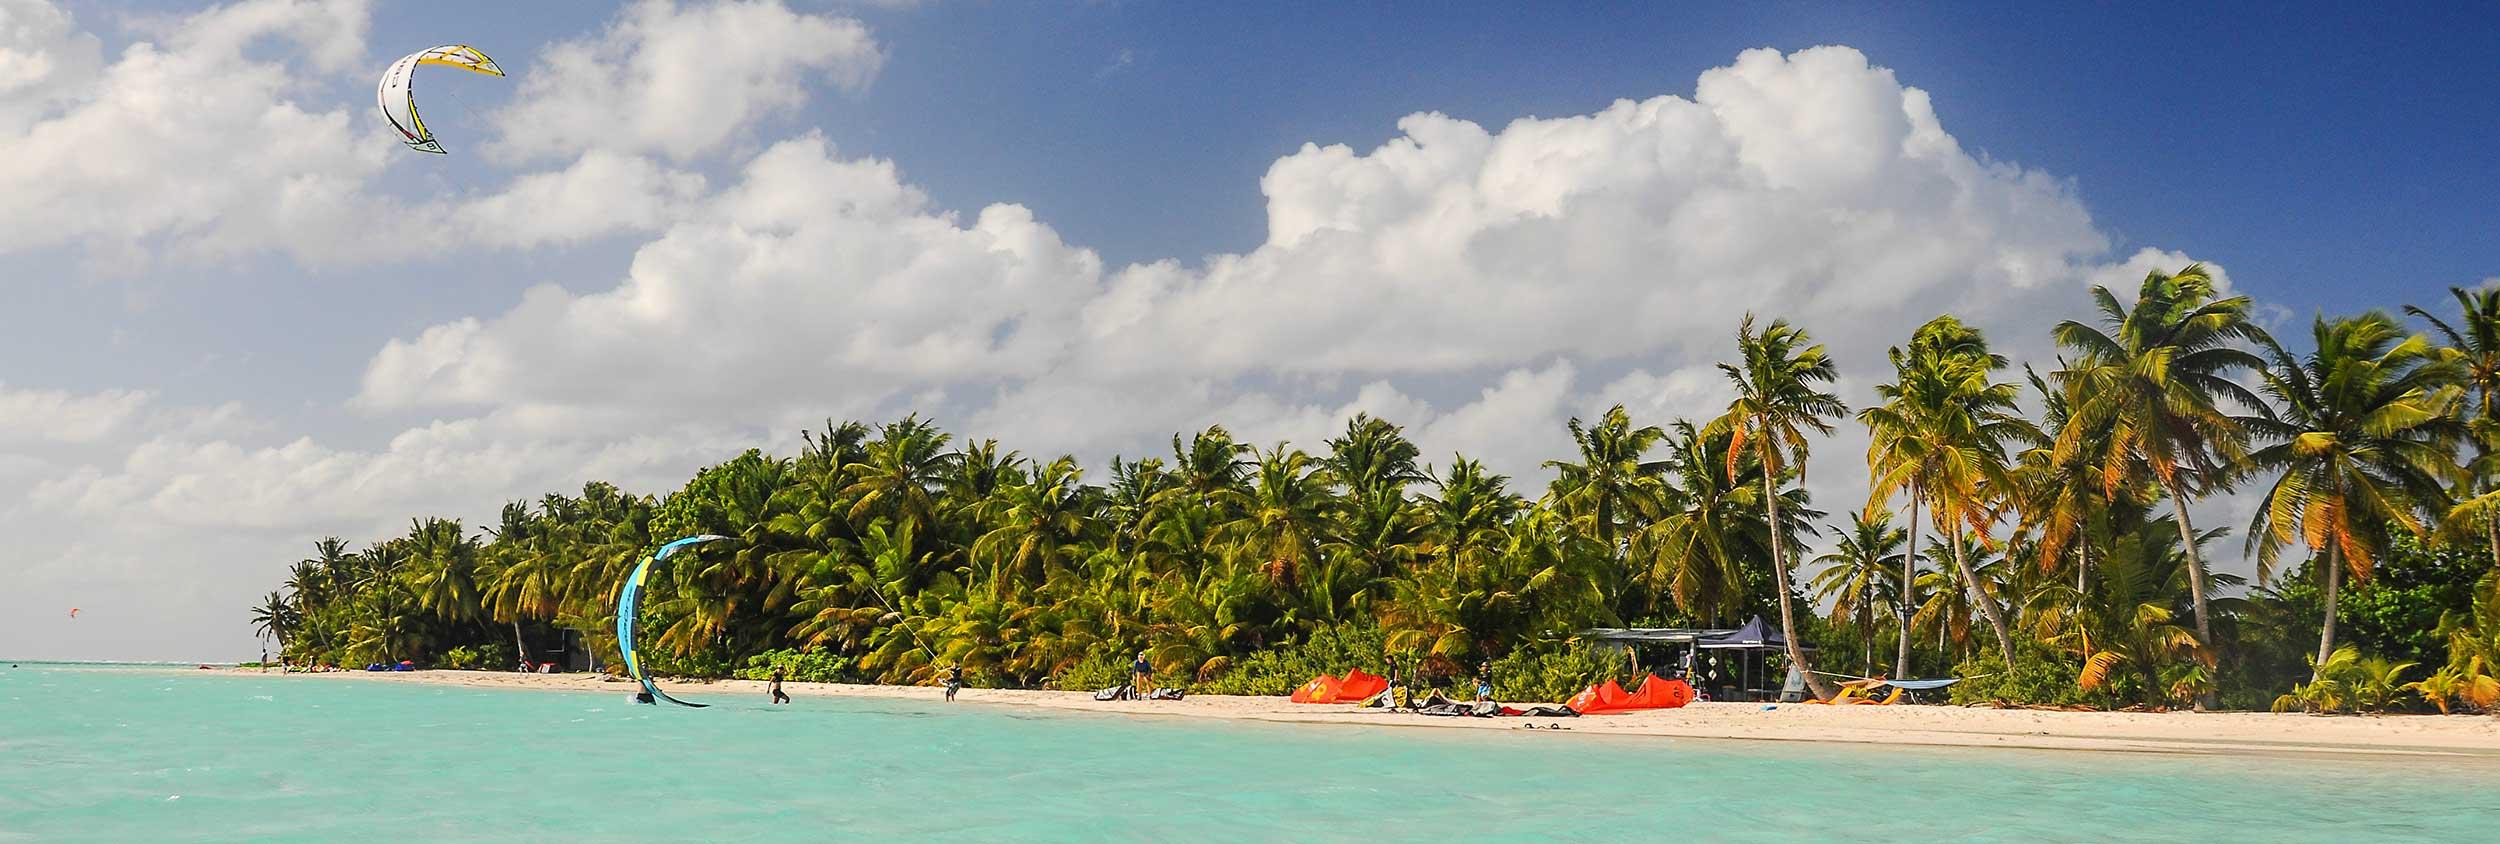 Cocos Keeling Islands hero Tom Hebert kitesurfing